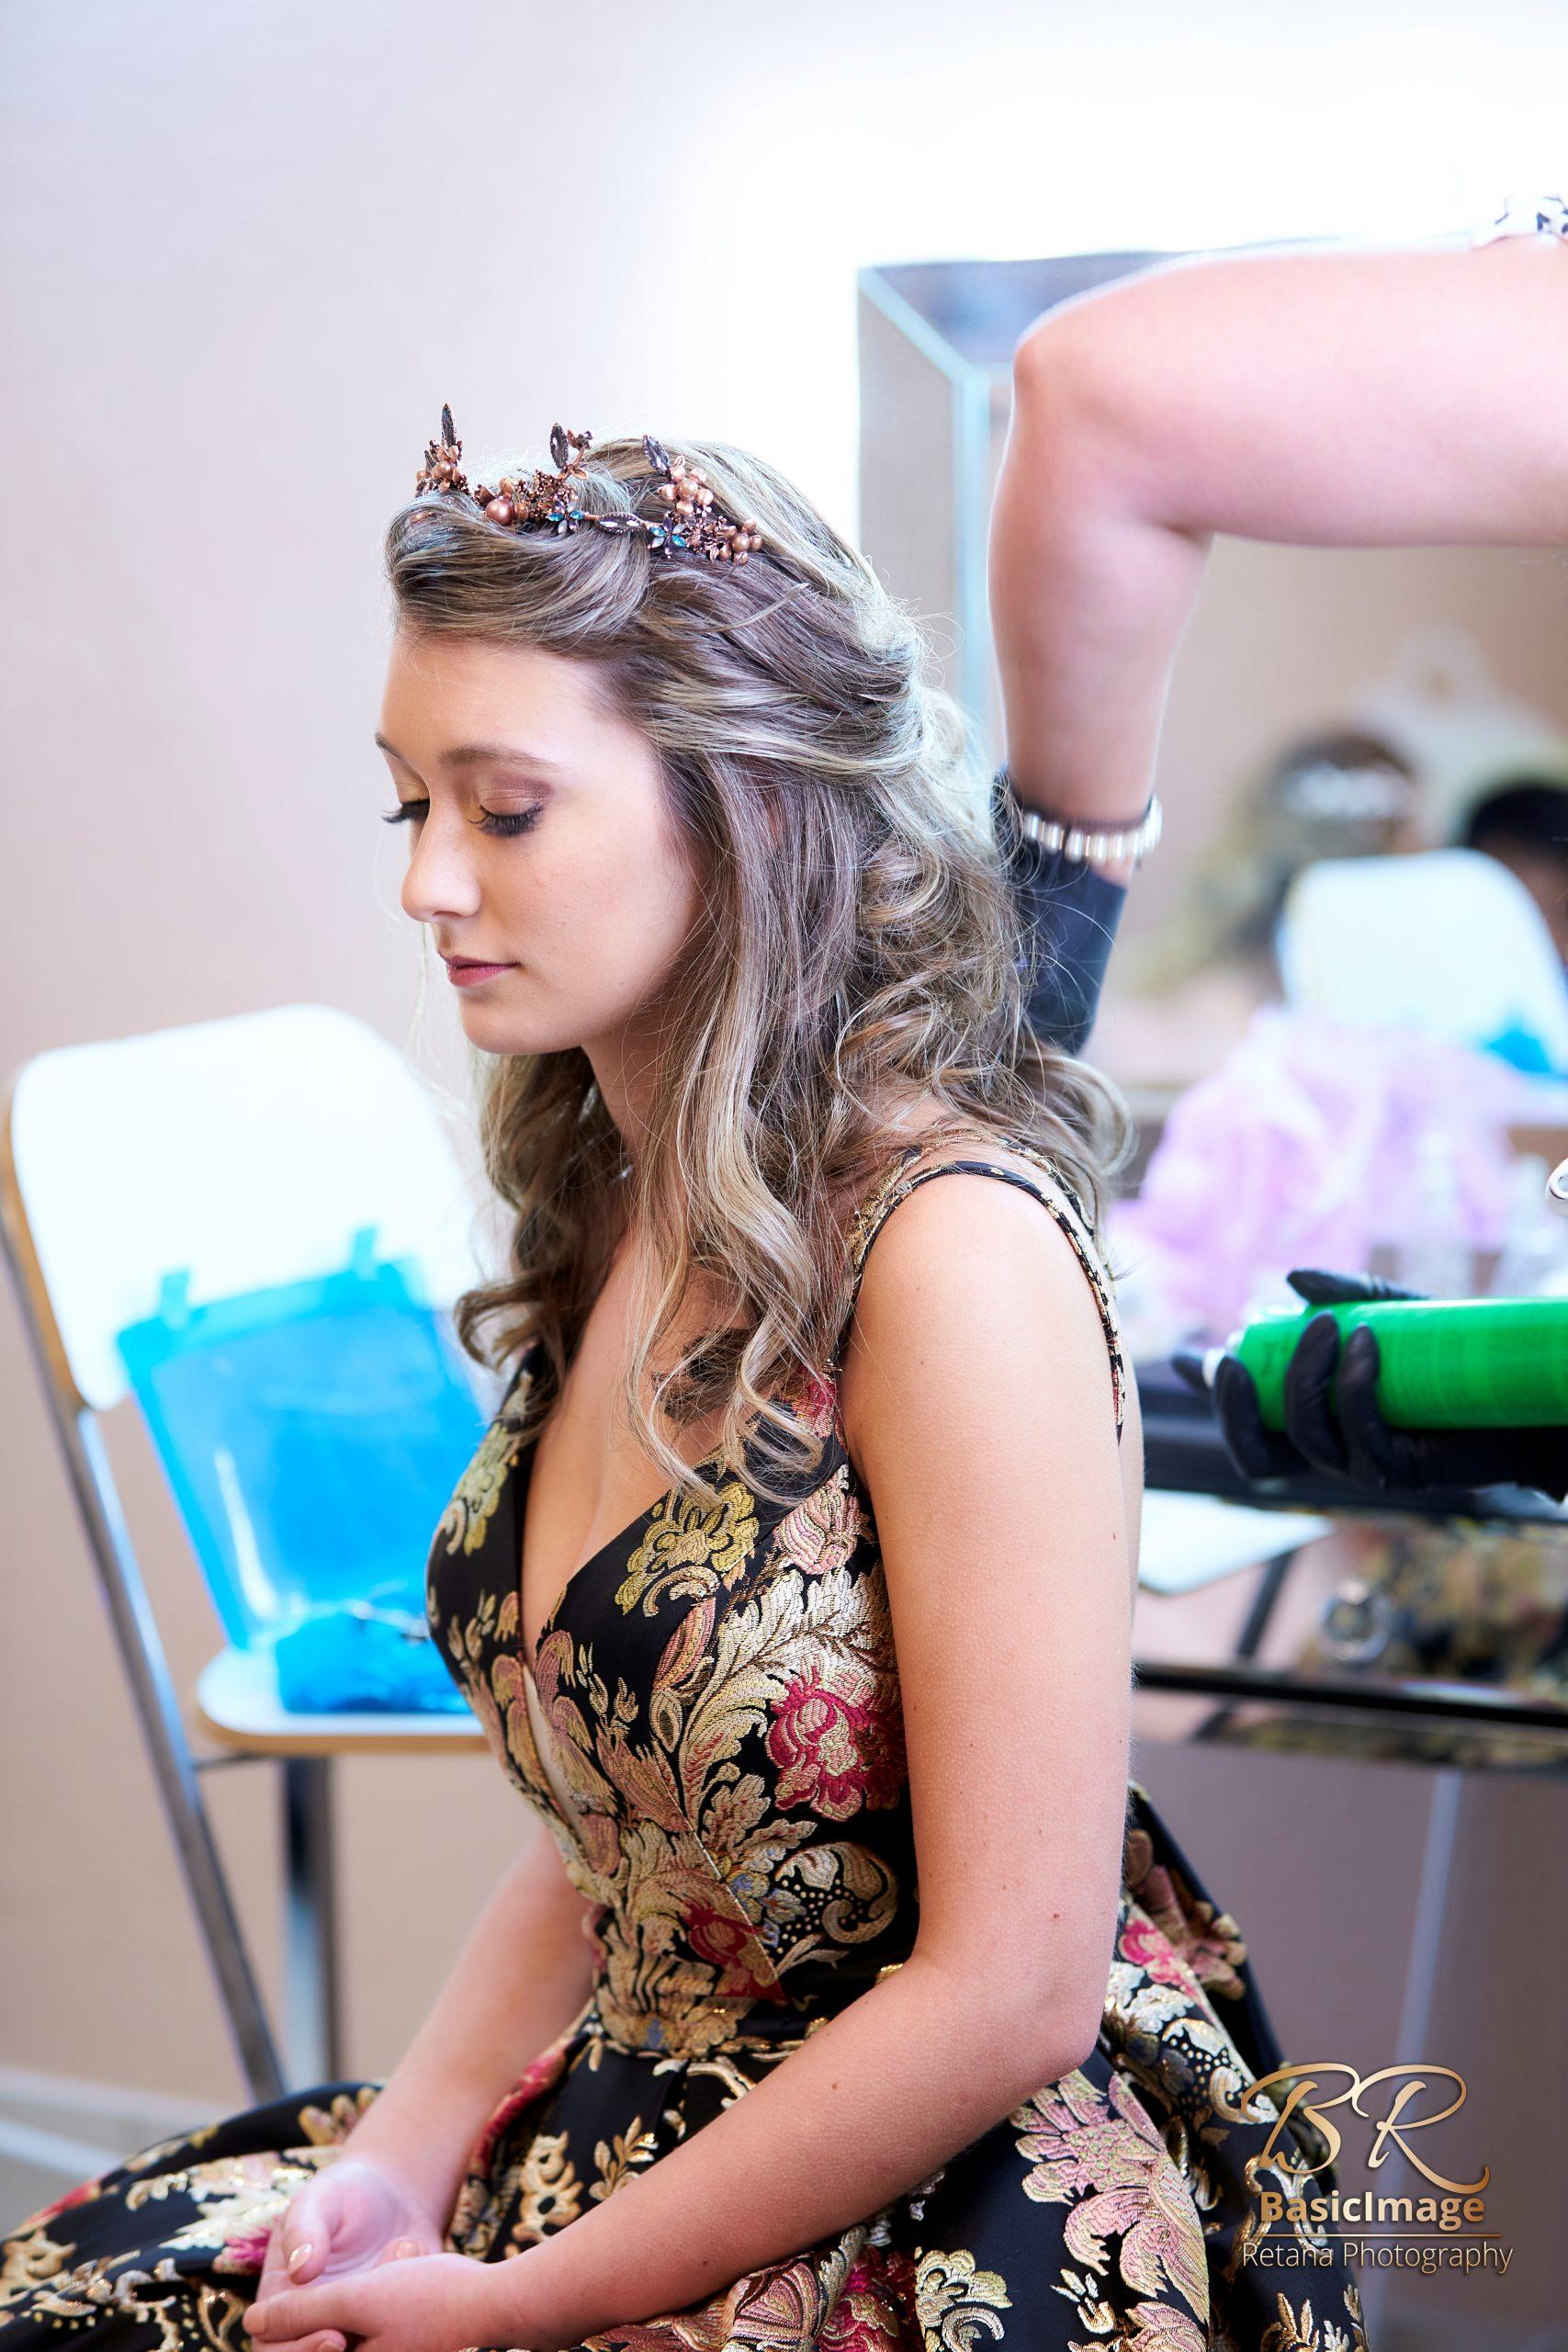 LeVenue model getting ready in VIP suite